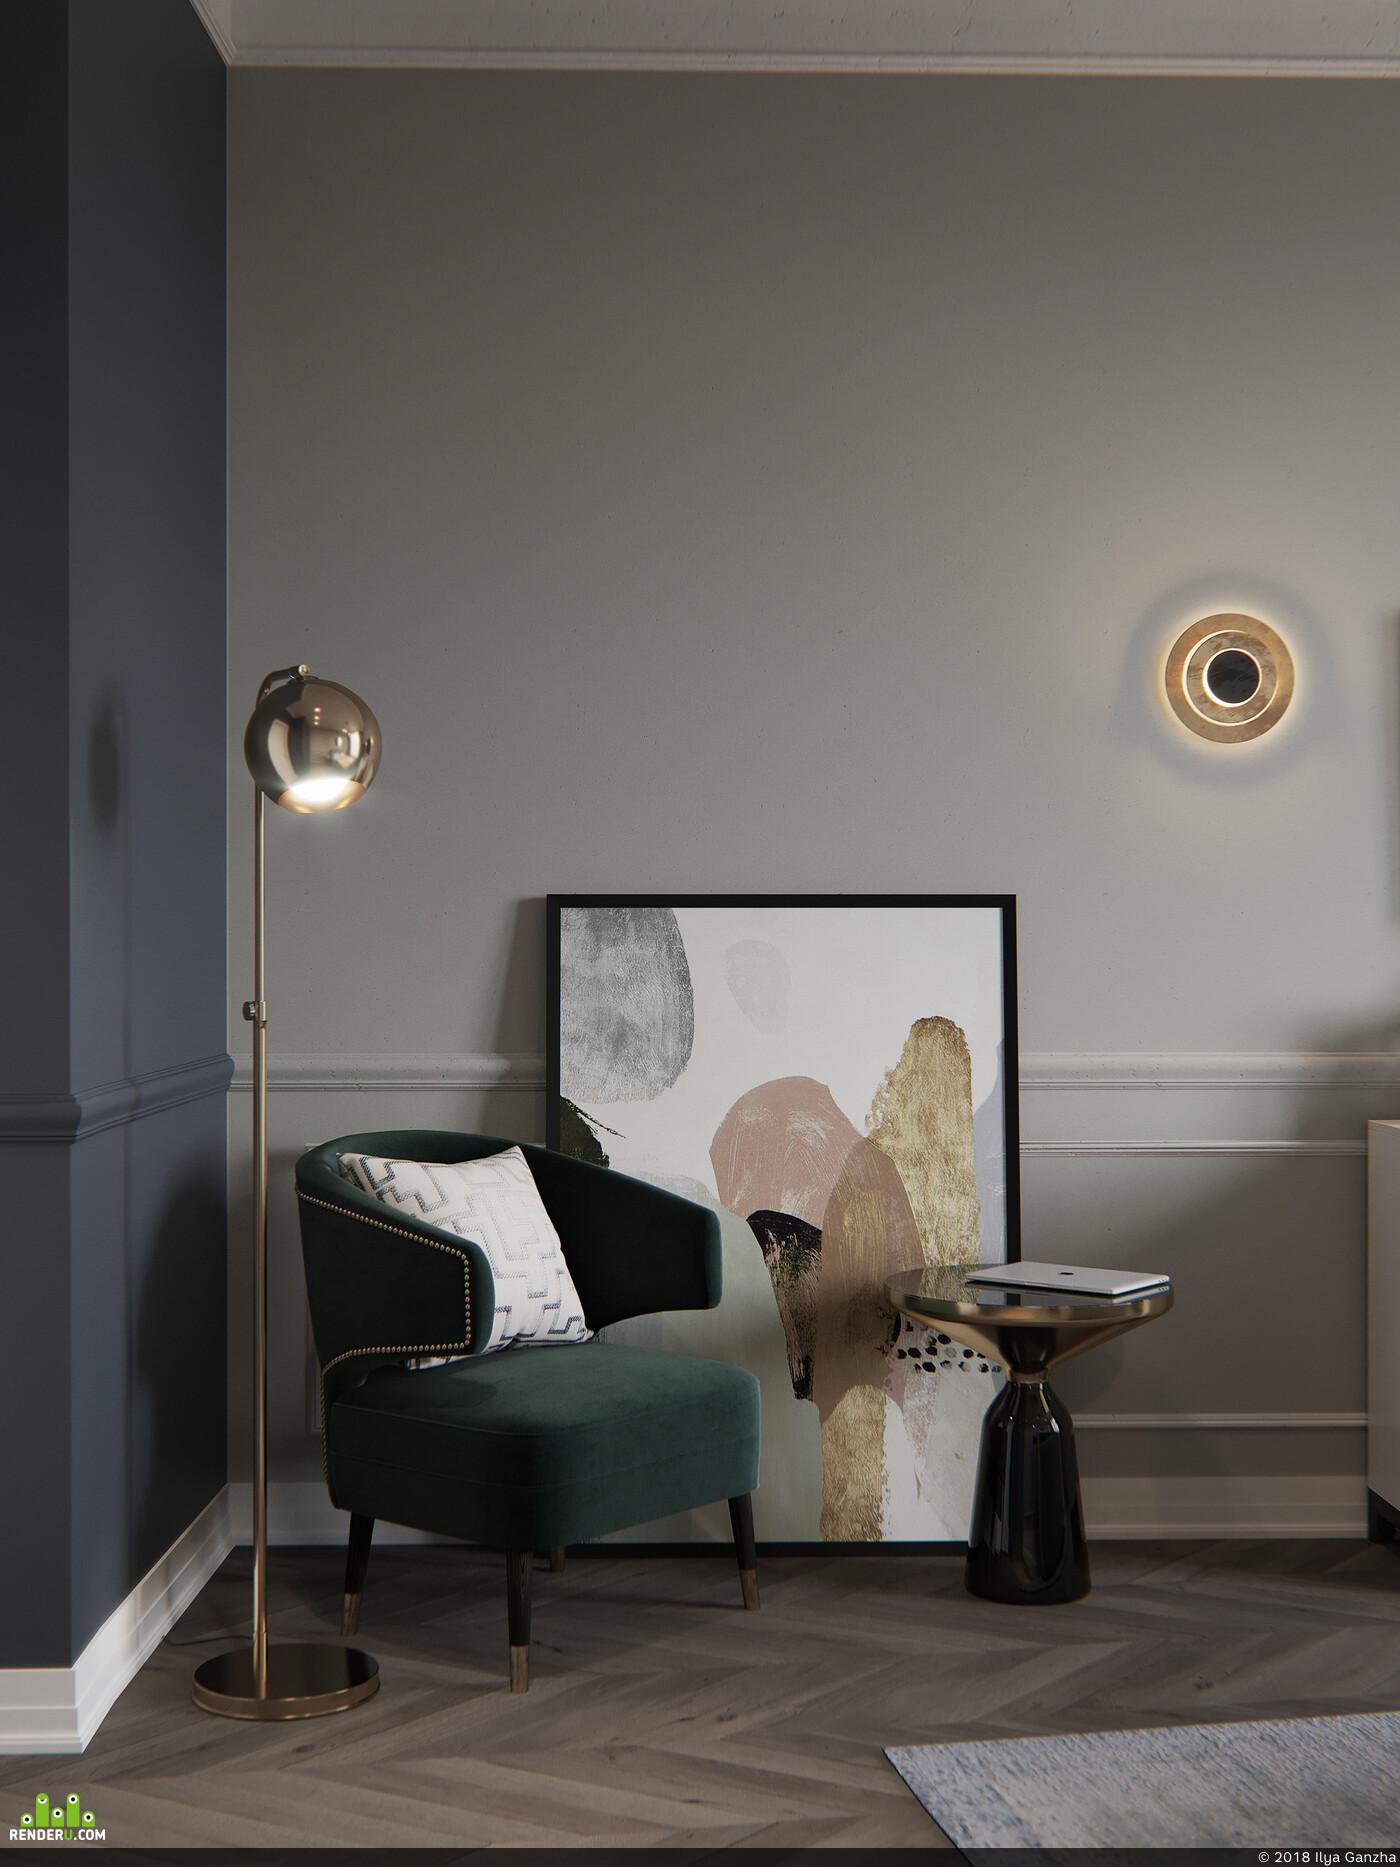 vizu, ganzha, interior design, designer, interior, rendering, Corona Renderer, 3ds max, Stockholm